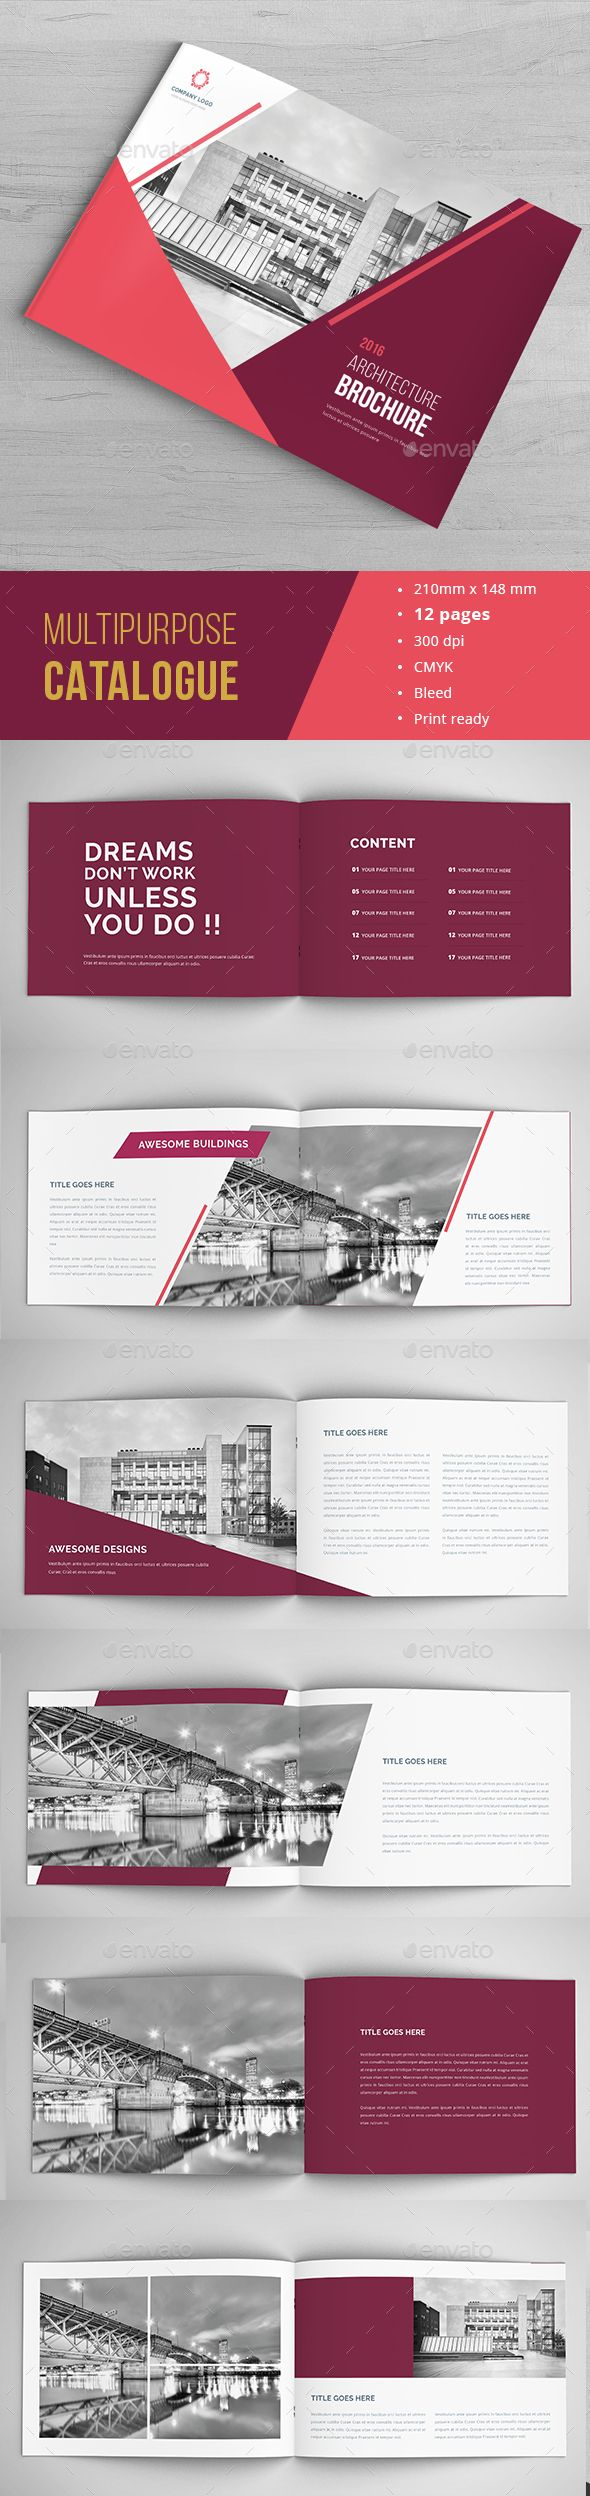 Arc Portfolio Brochure Template InDesign INDD. Download here: http://graphicriver.net/item/arc-indesign-portfolio/16655250?ref=ksioks